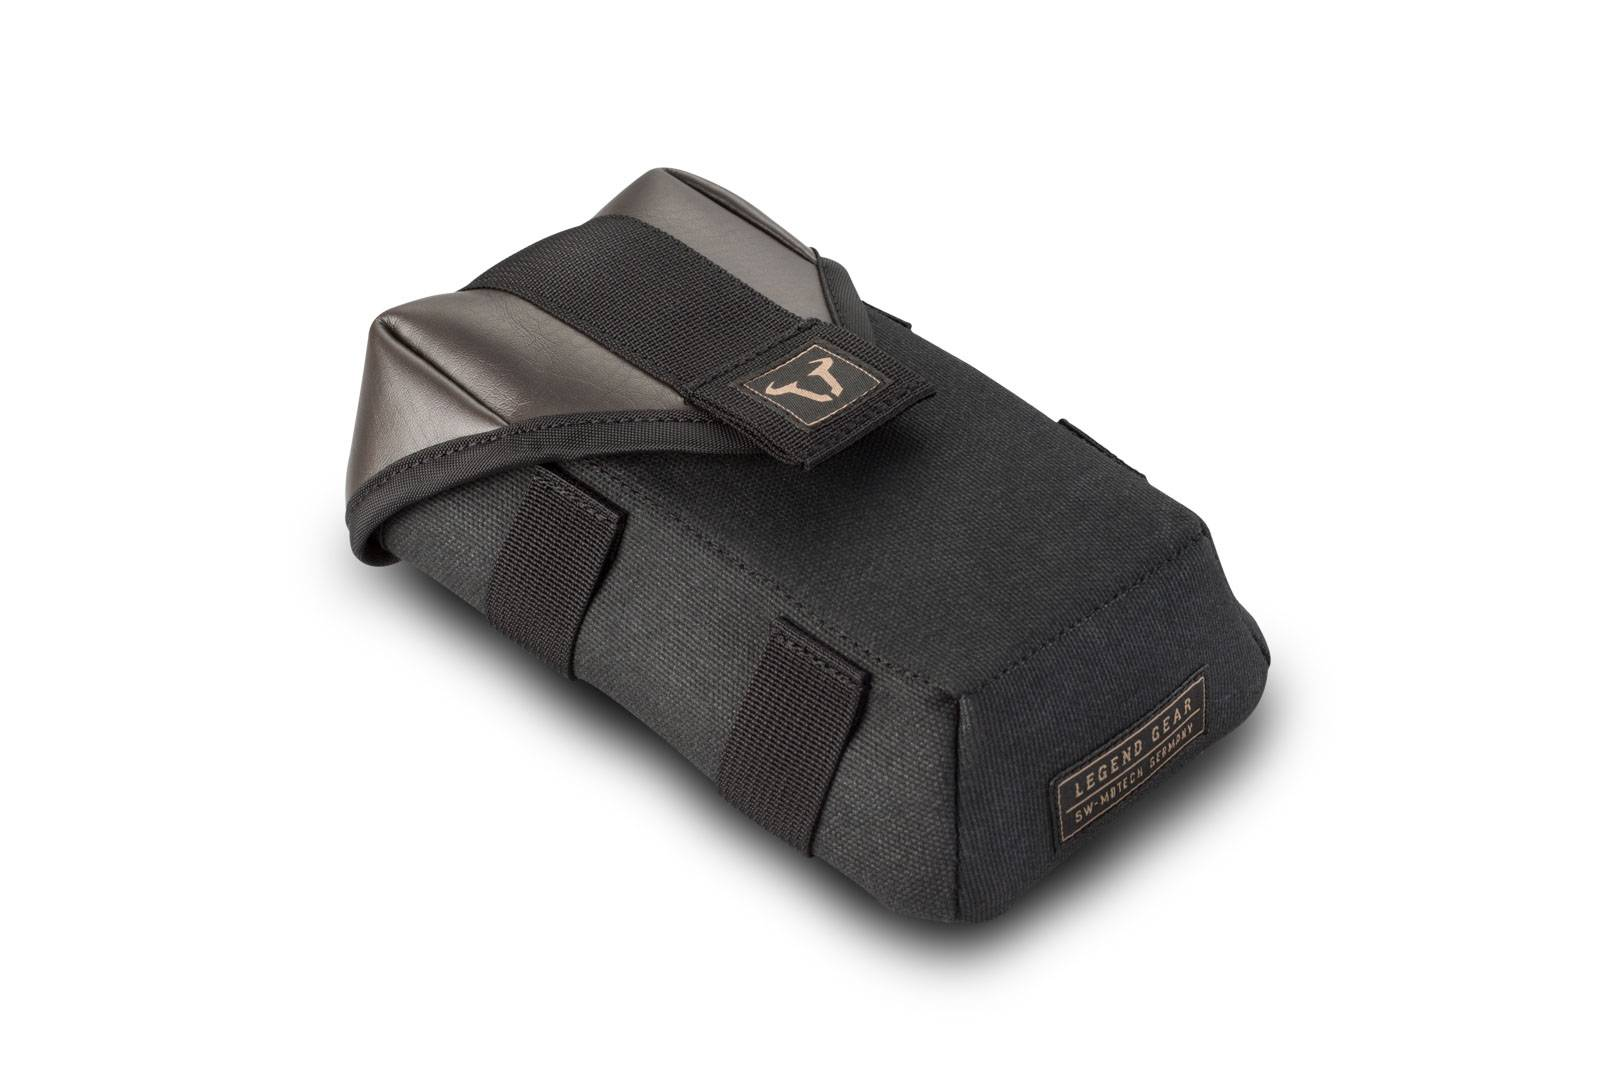 SW-Motech Legend Gear accessory bag LA1 - 0.8 l. Splash-proof. acce...